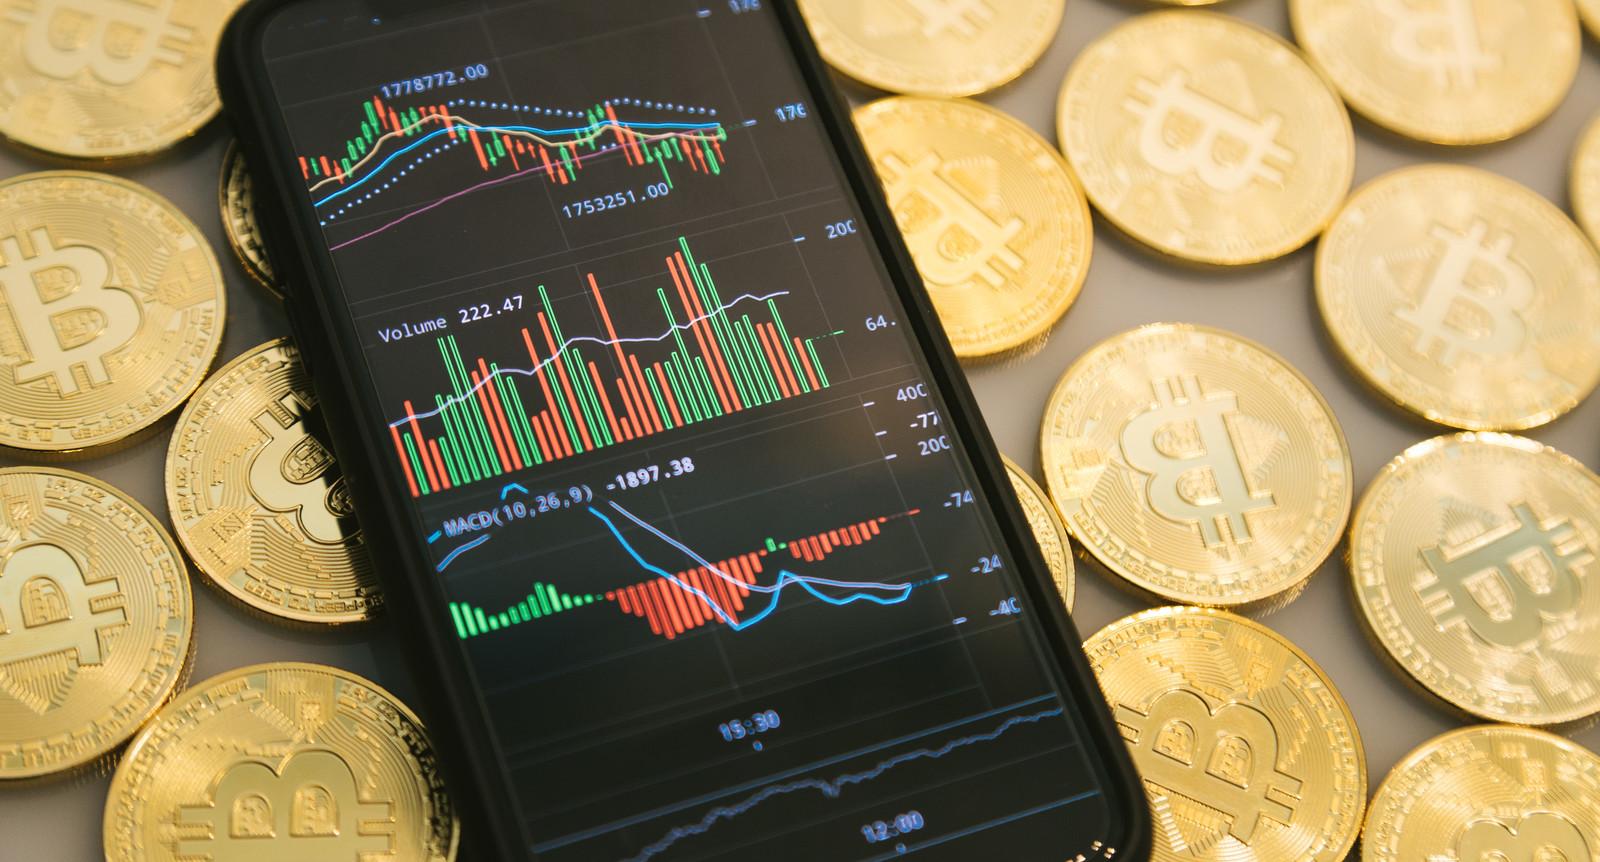 cryptocurrency trading(暗号資産(仮想通貨)取引)